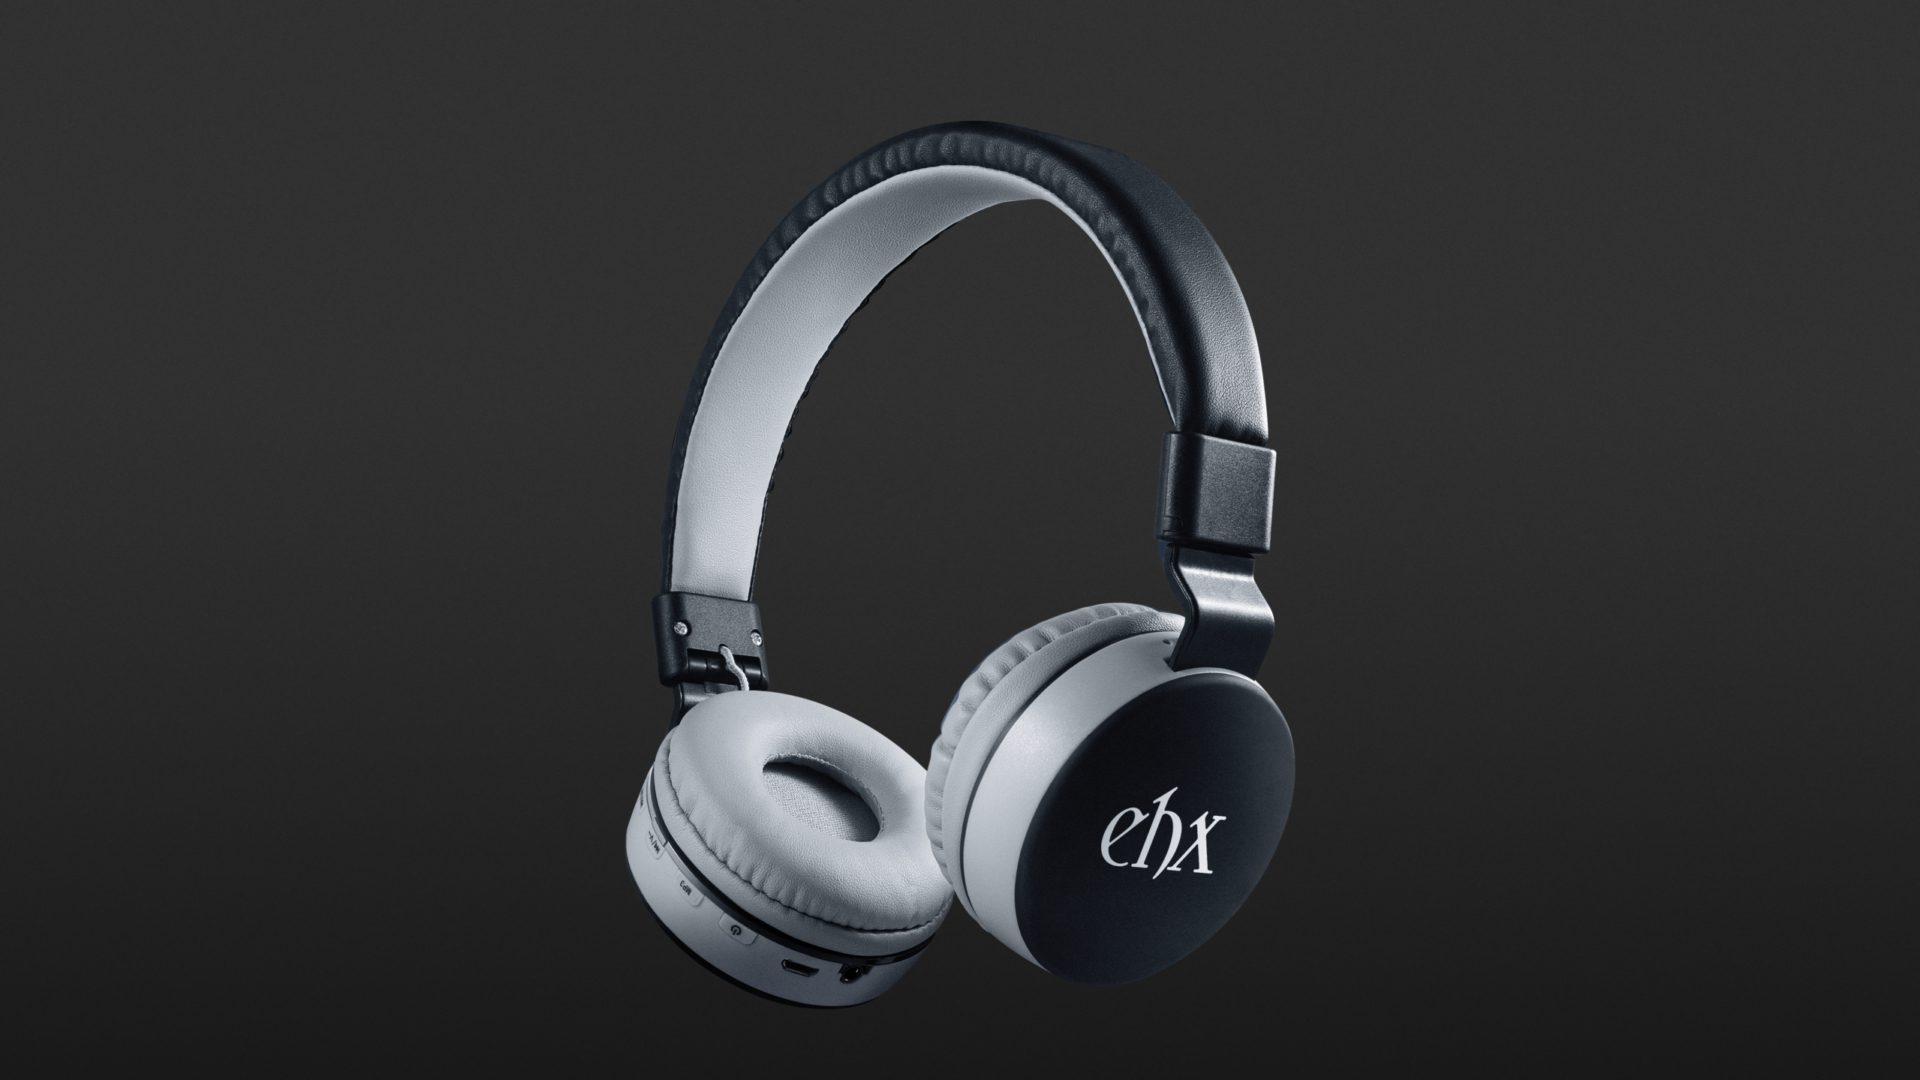 Electro-Harmonix EHX NYC Cans